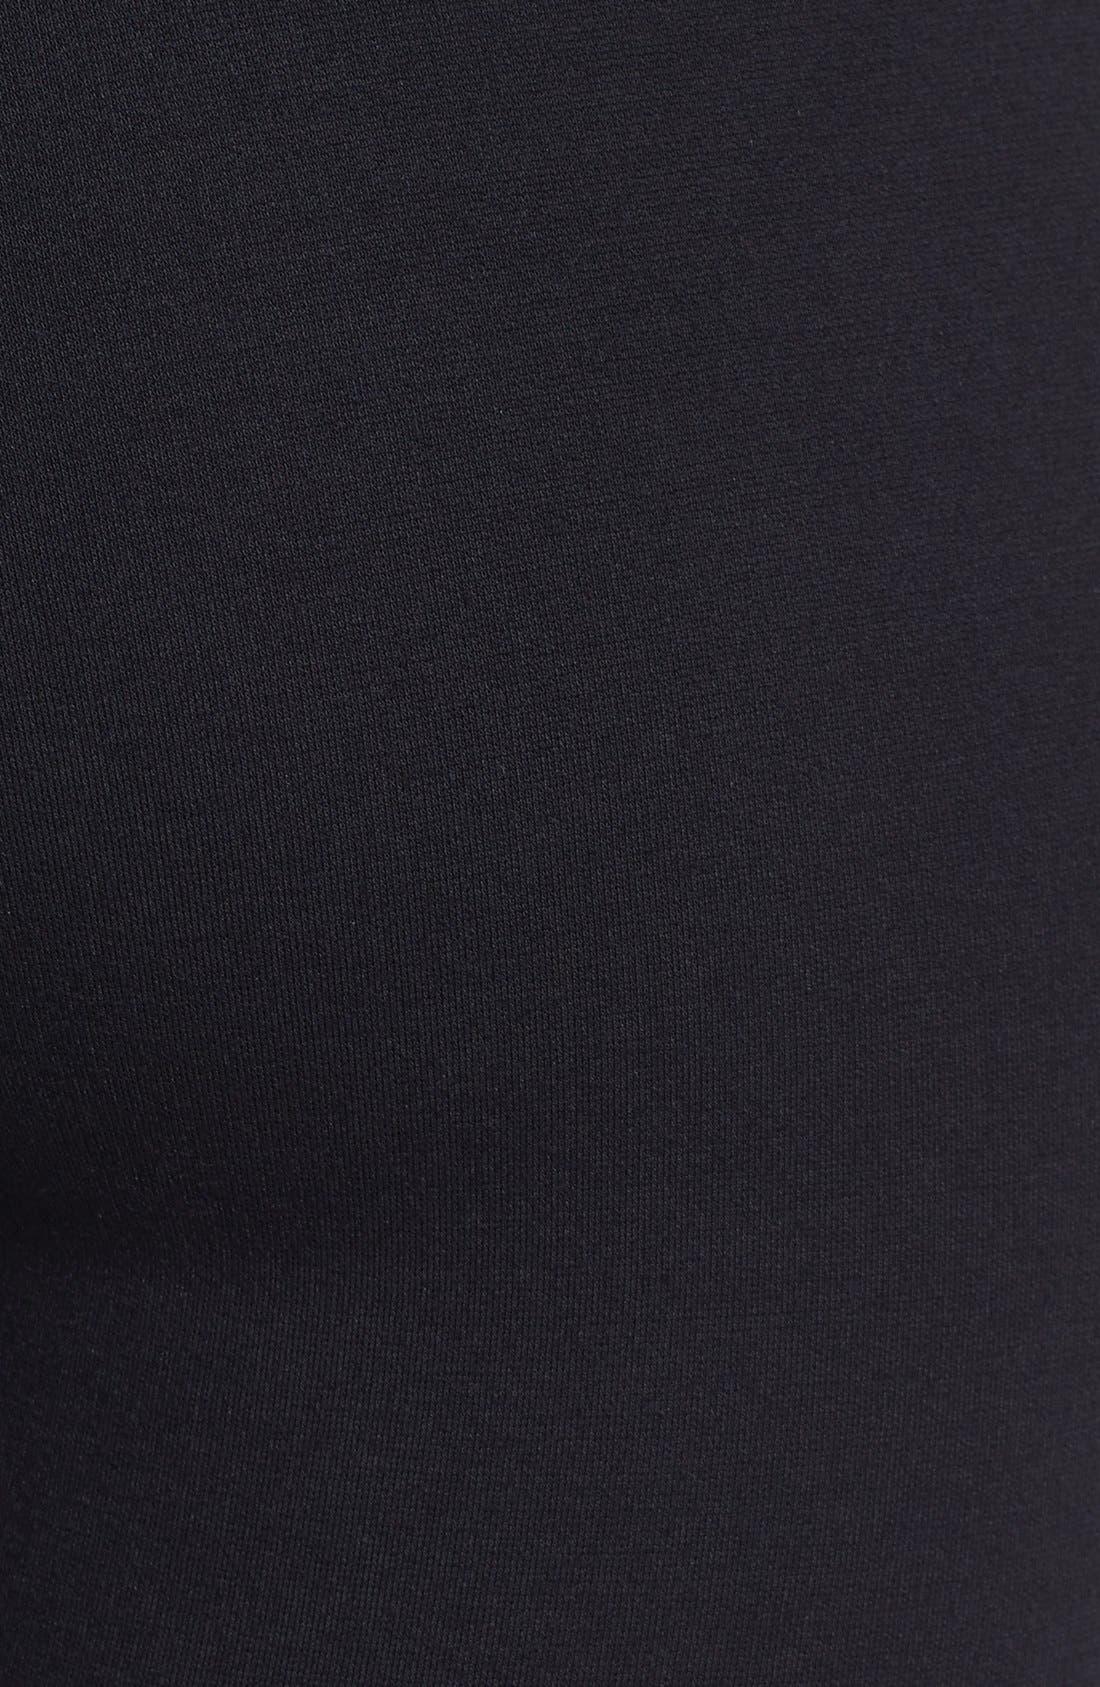 Alternate Image 3  - Ella Moss 'Sandra' Faux Leather Trim Leggings